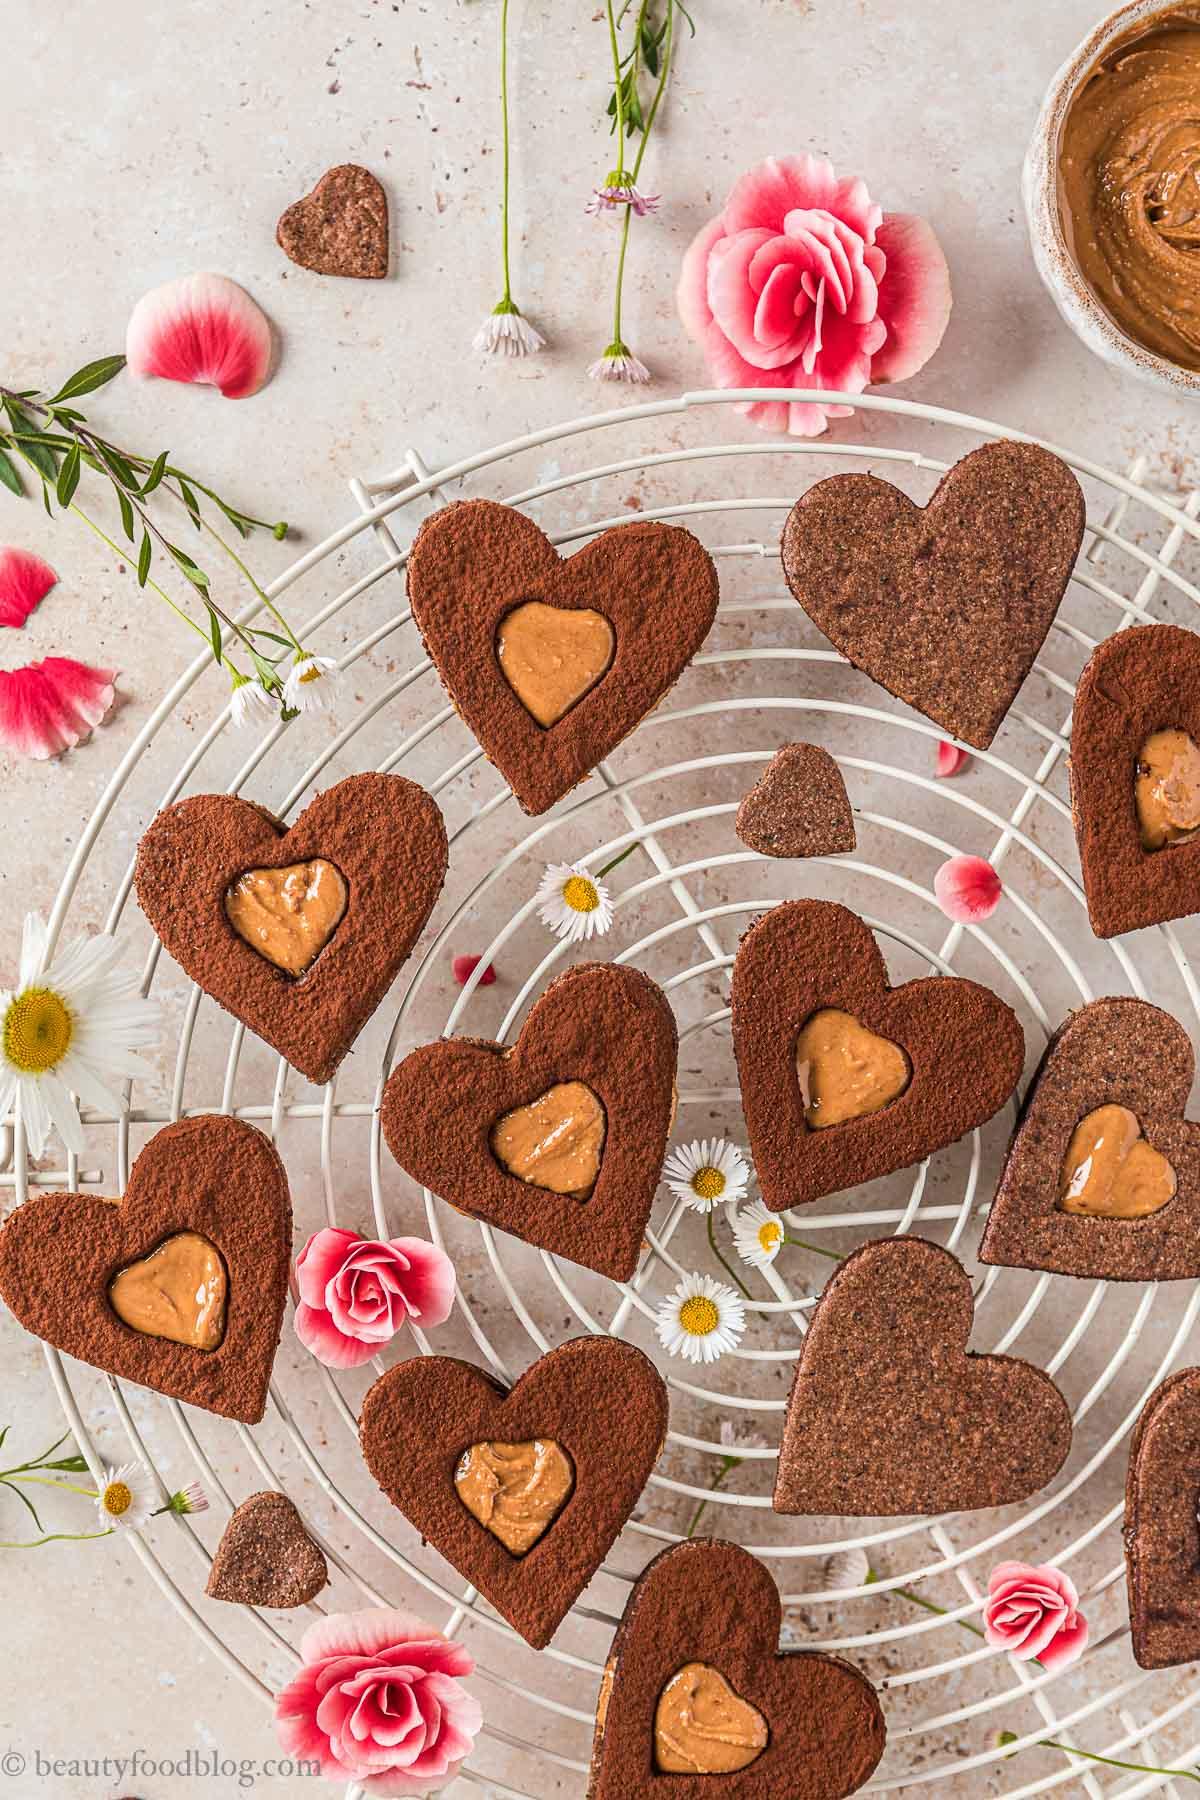 Frollini vegani senza glutine al cacao e caffè gluten-free vegan chocolate almond Linzer cookies espresso coffee